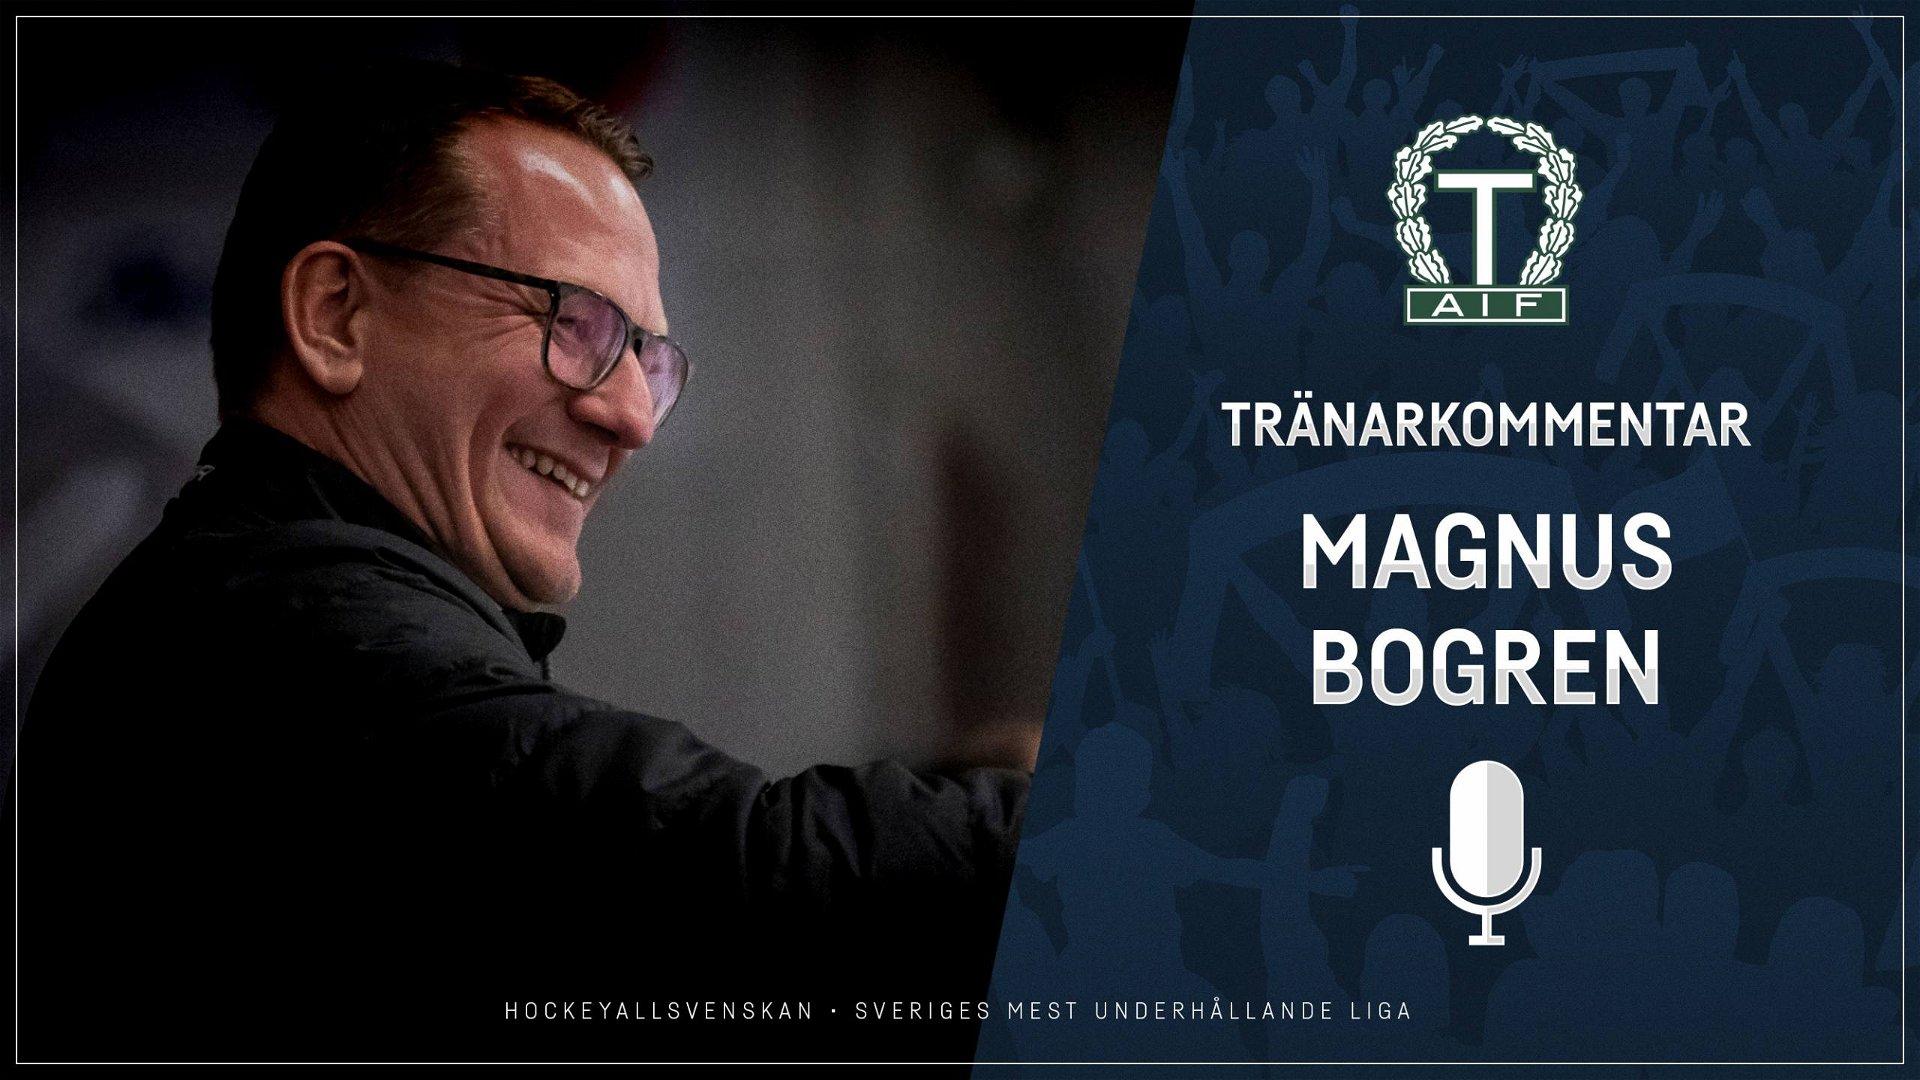 2021-01-17 Segerintervju: Magnus Bogren